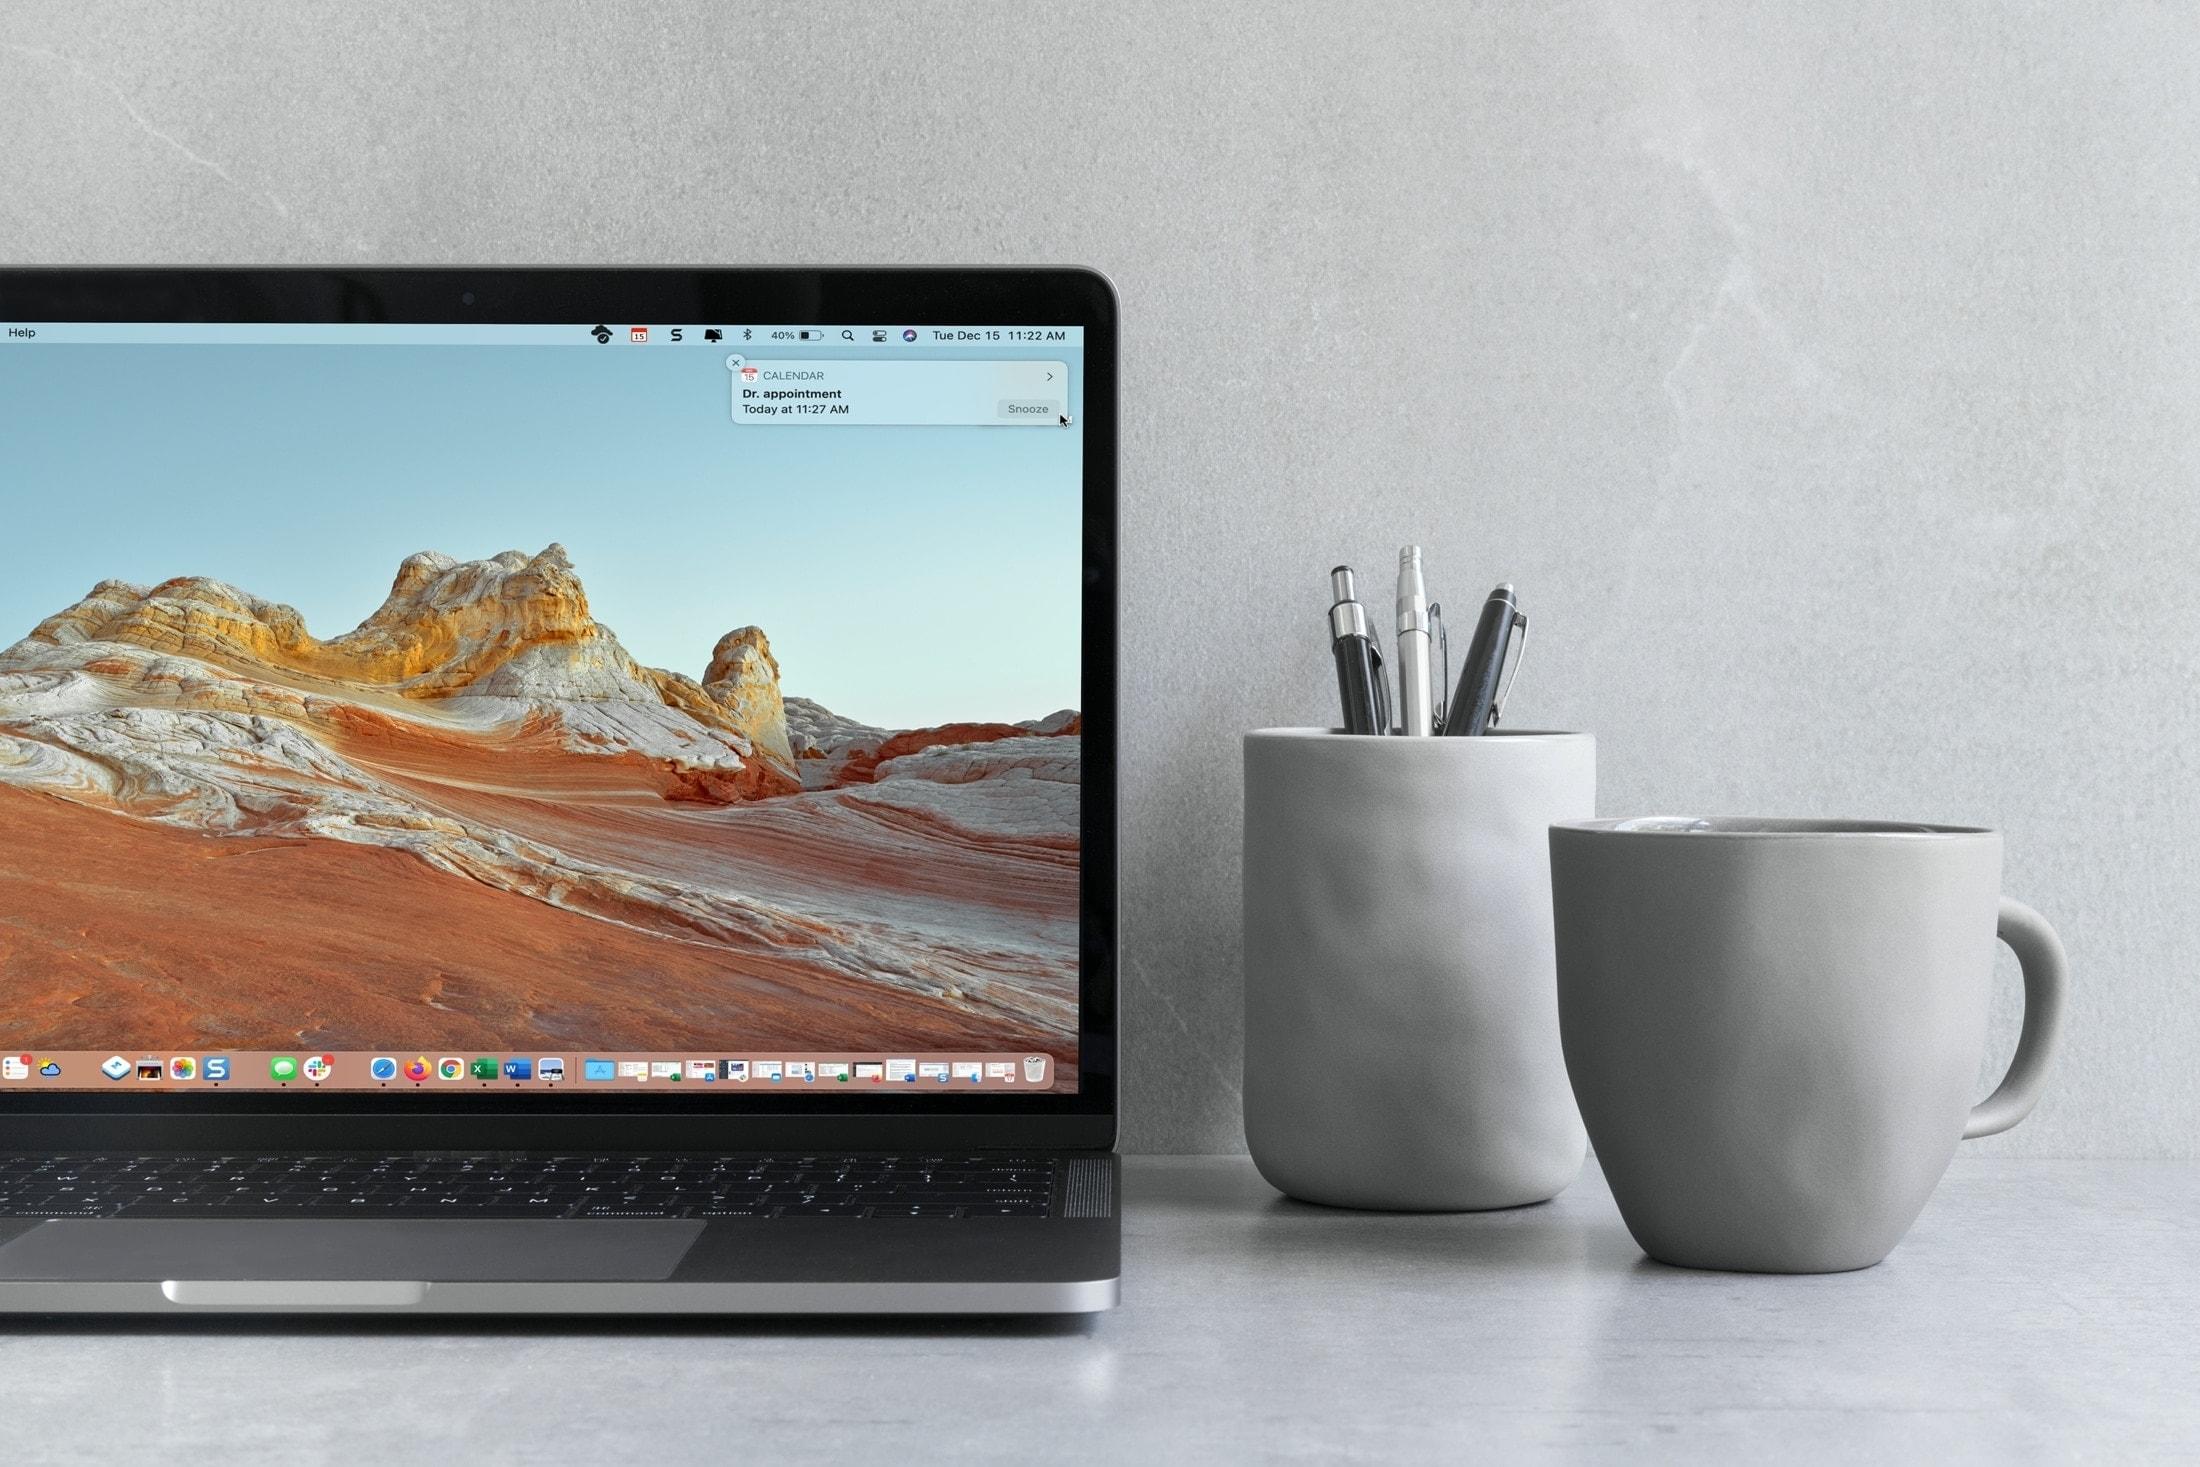 Snooze Calendar Event on MacBook Screen